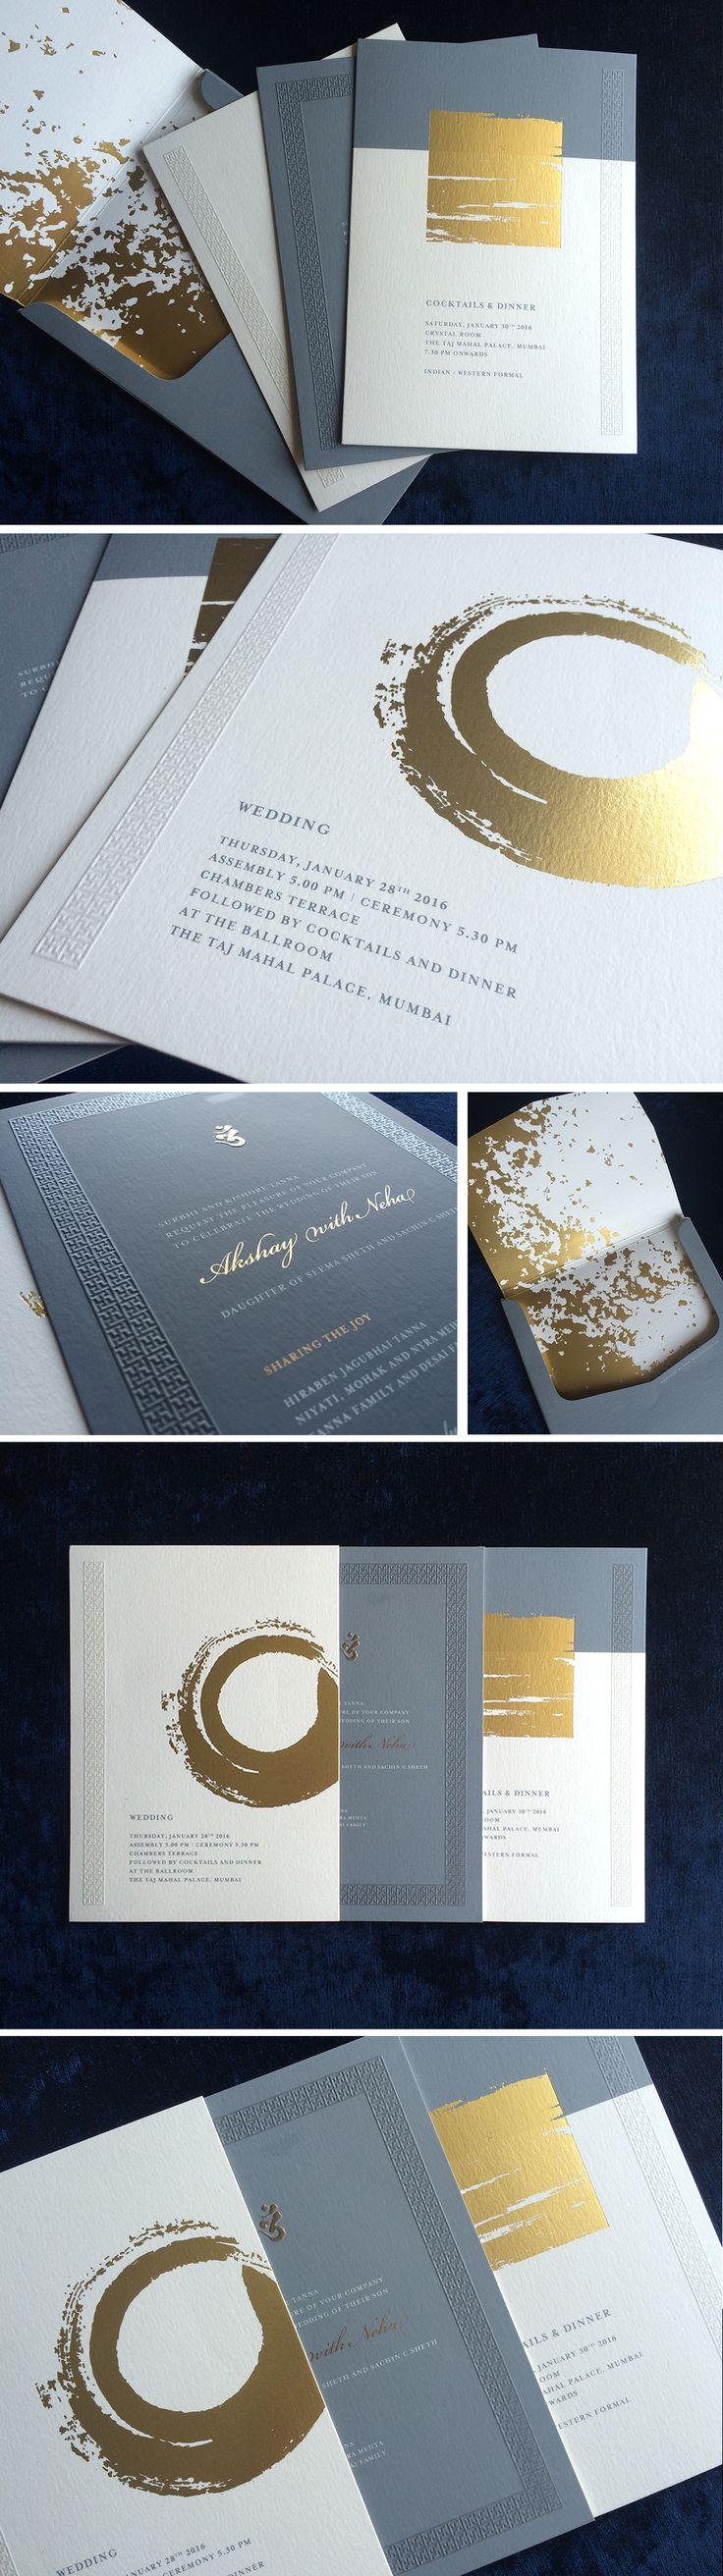 Wedding card - 03 on Behance